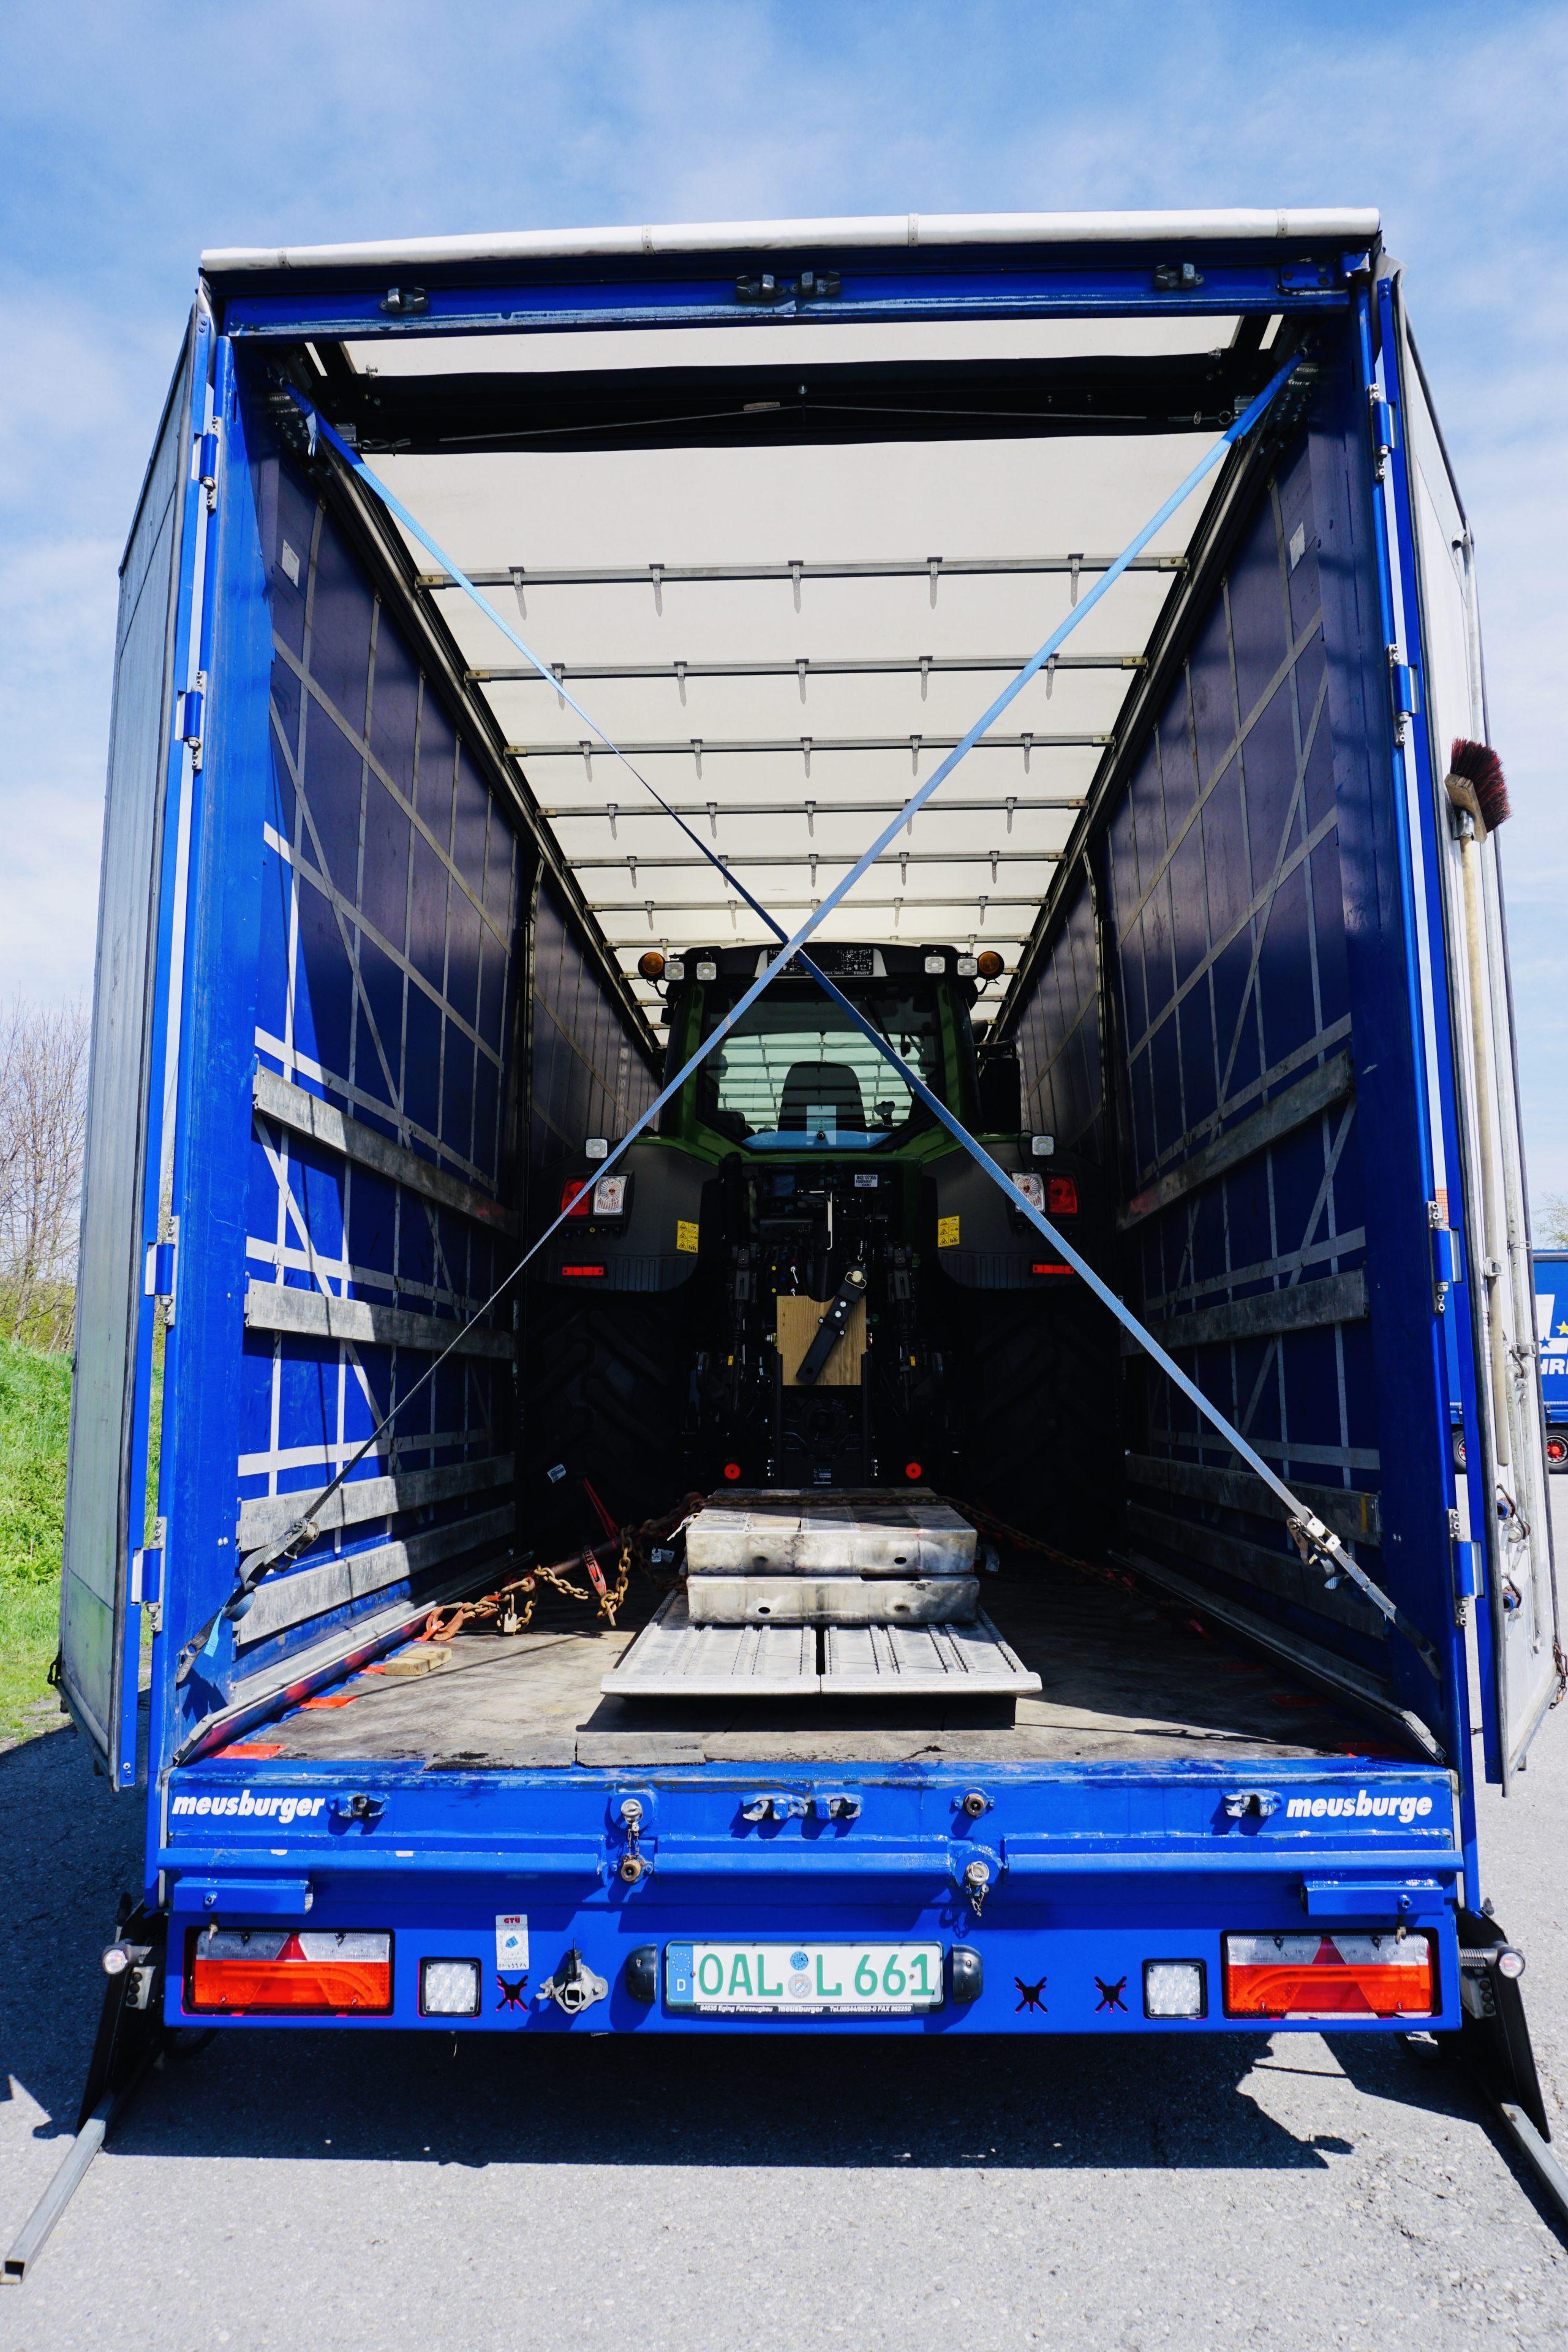 https://www.lechzug.de/wp-content/uploads/Traktor_Transporte_Plane-e1578917427491.jpeg